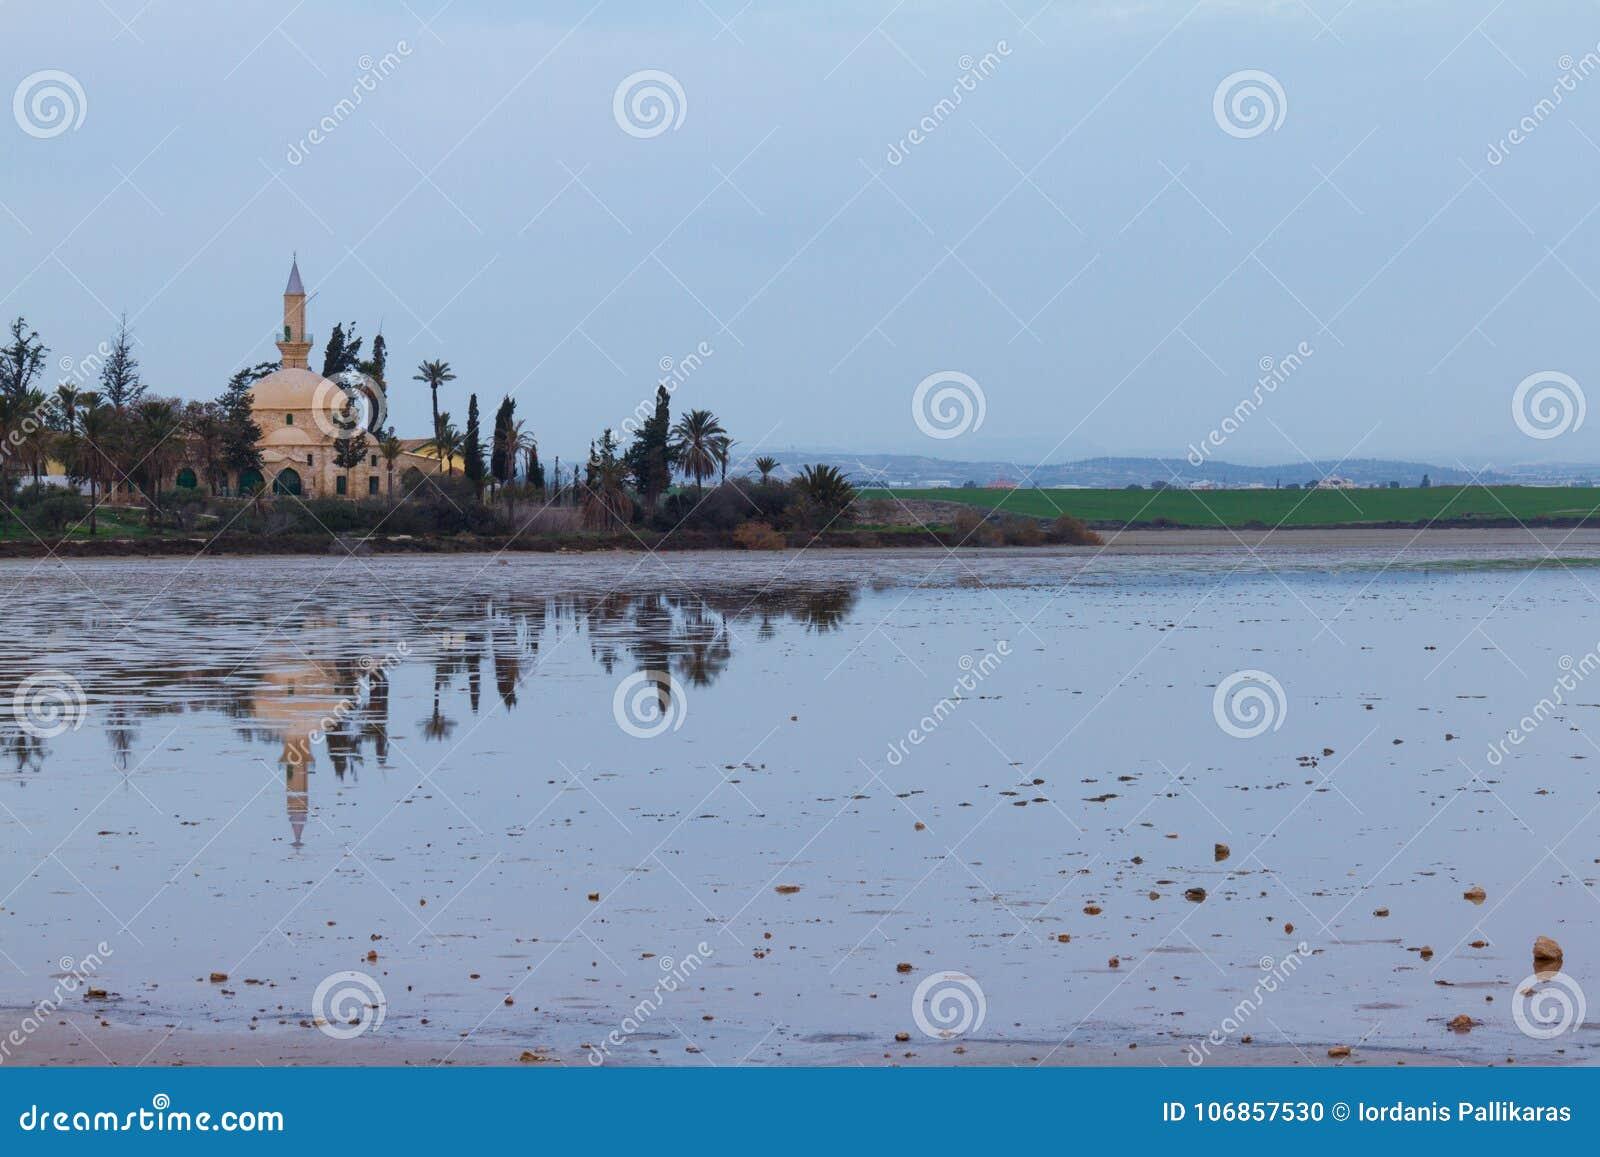 Hala Sultan Tekke på den Larnaca salt-sjön i det Cypern landskapet